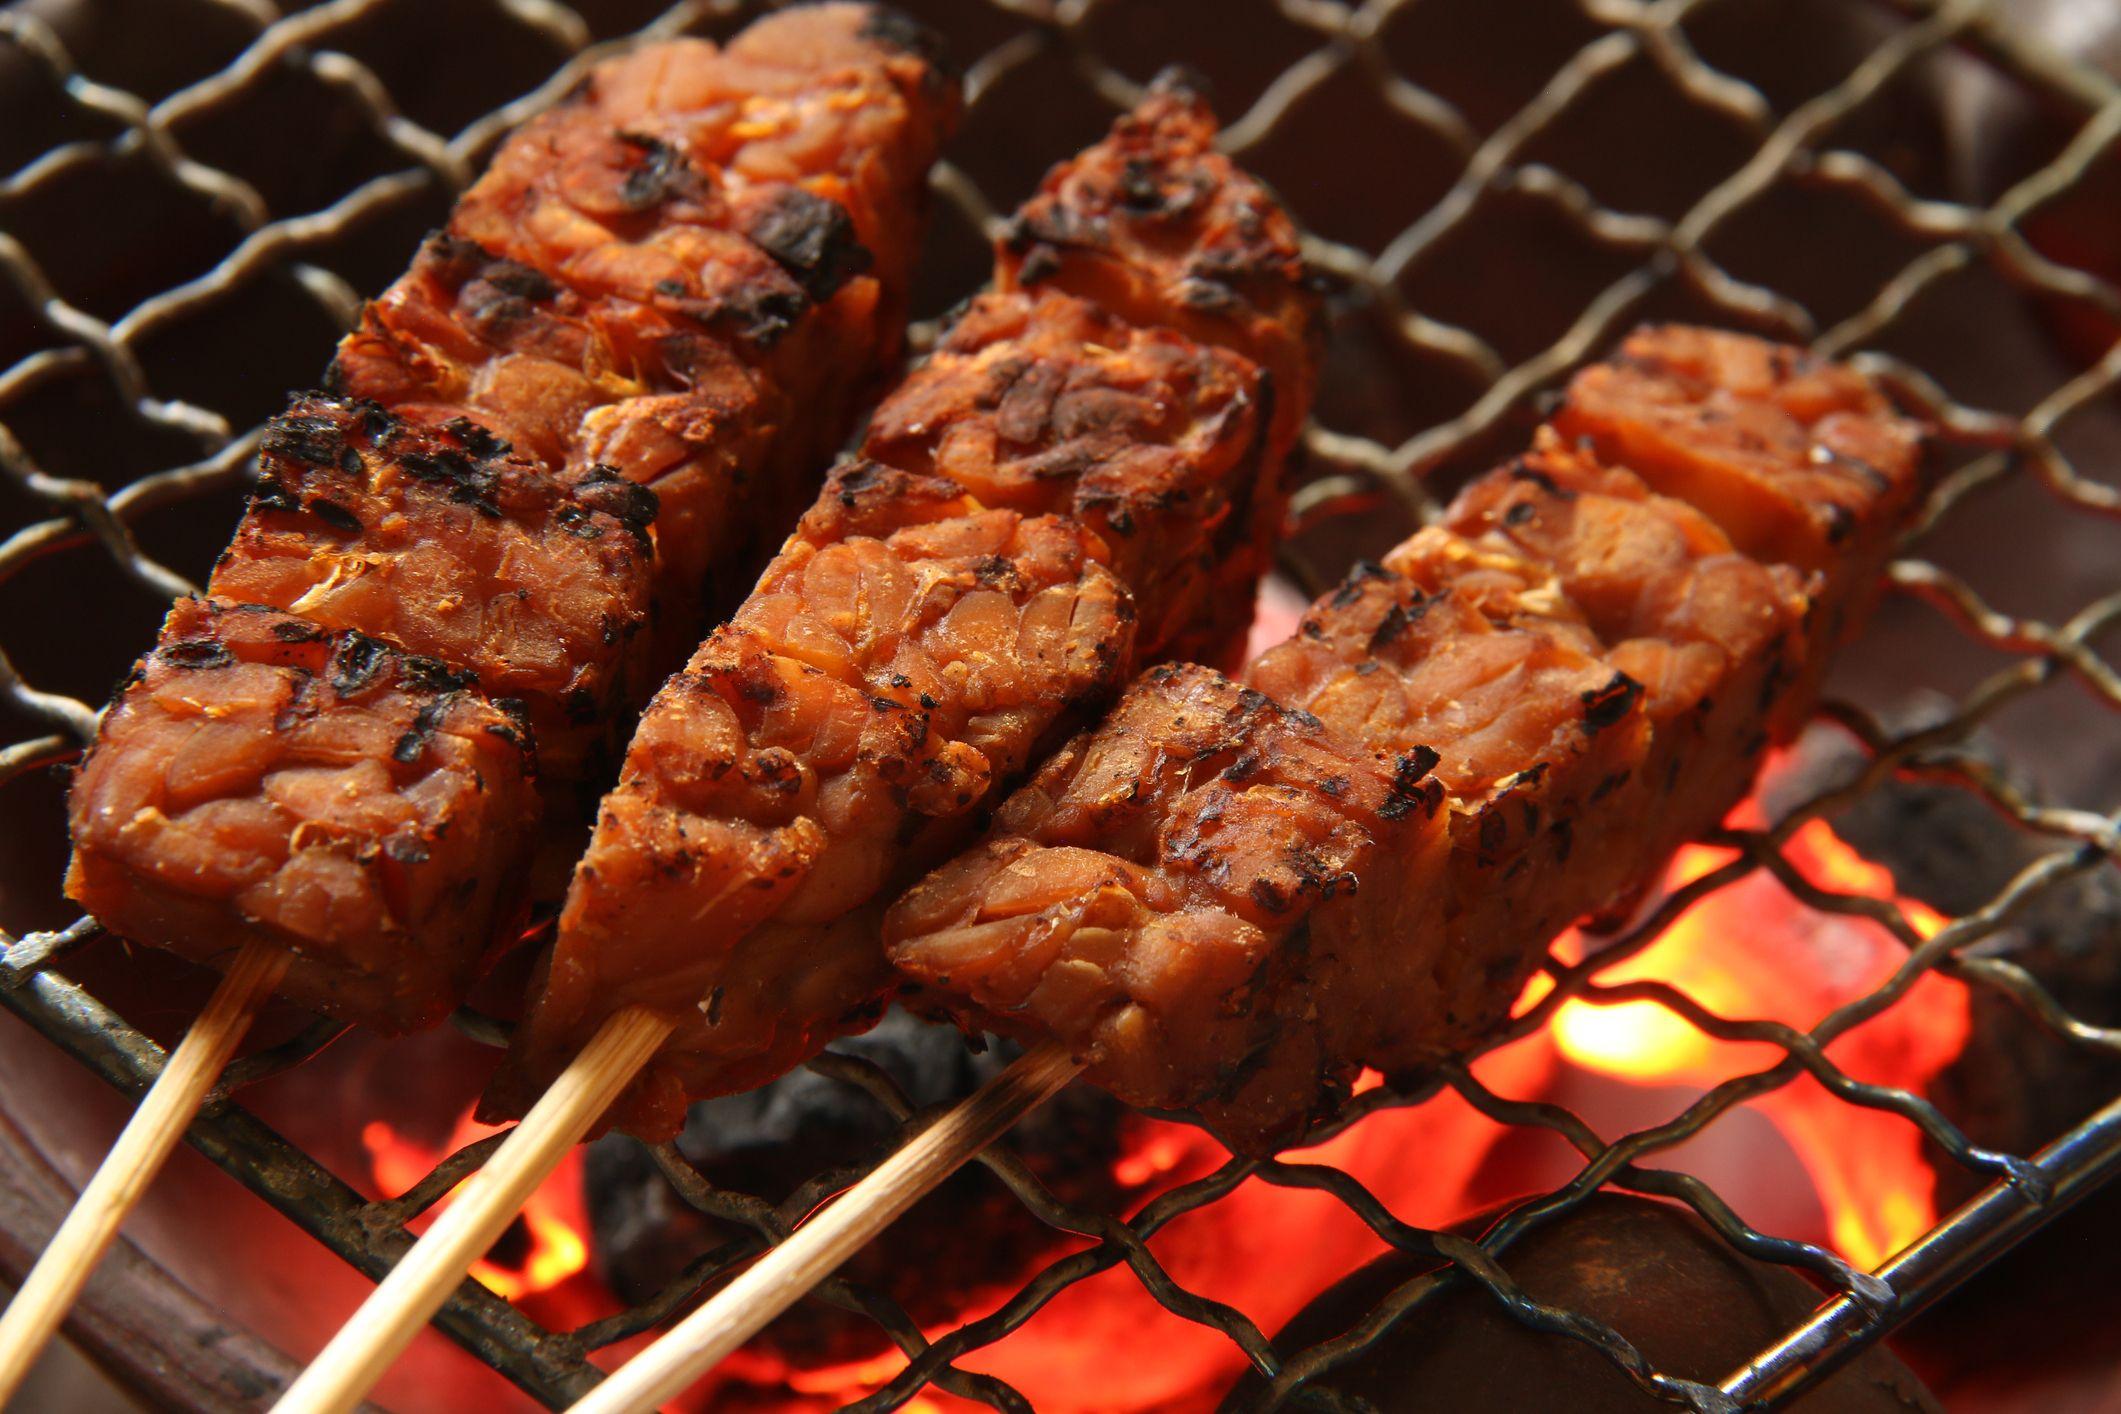 Sate Kere, the Popular Street Food of Tempeh Satay from Surakarta / Solo